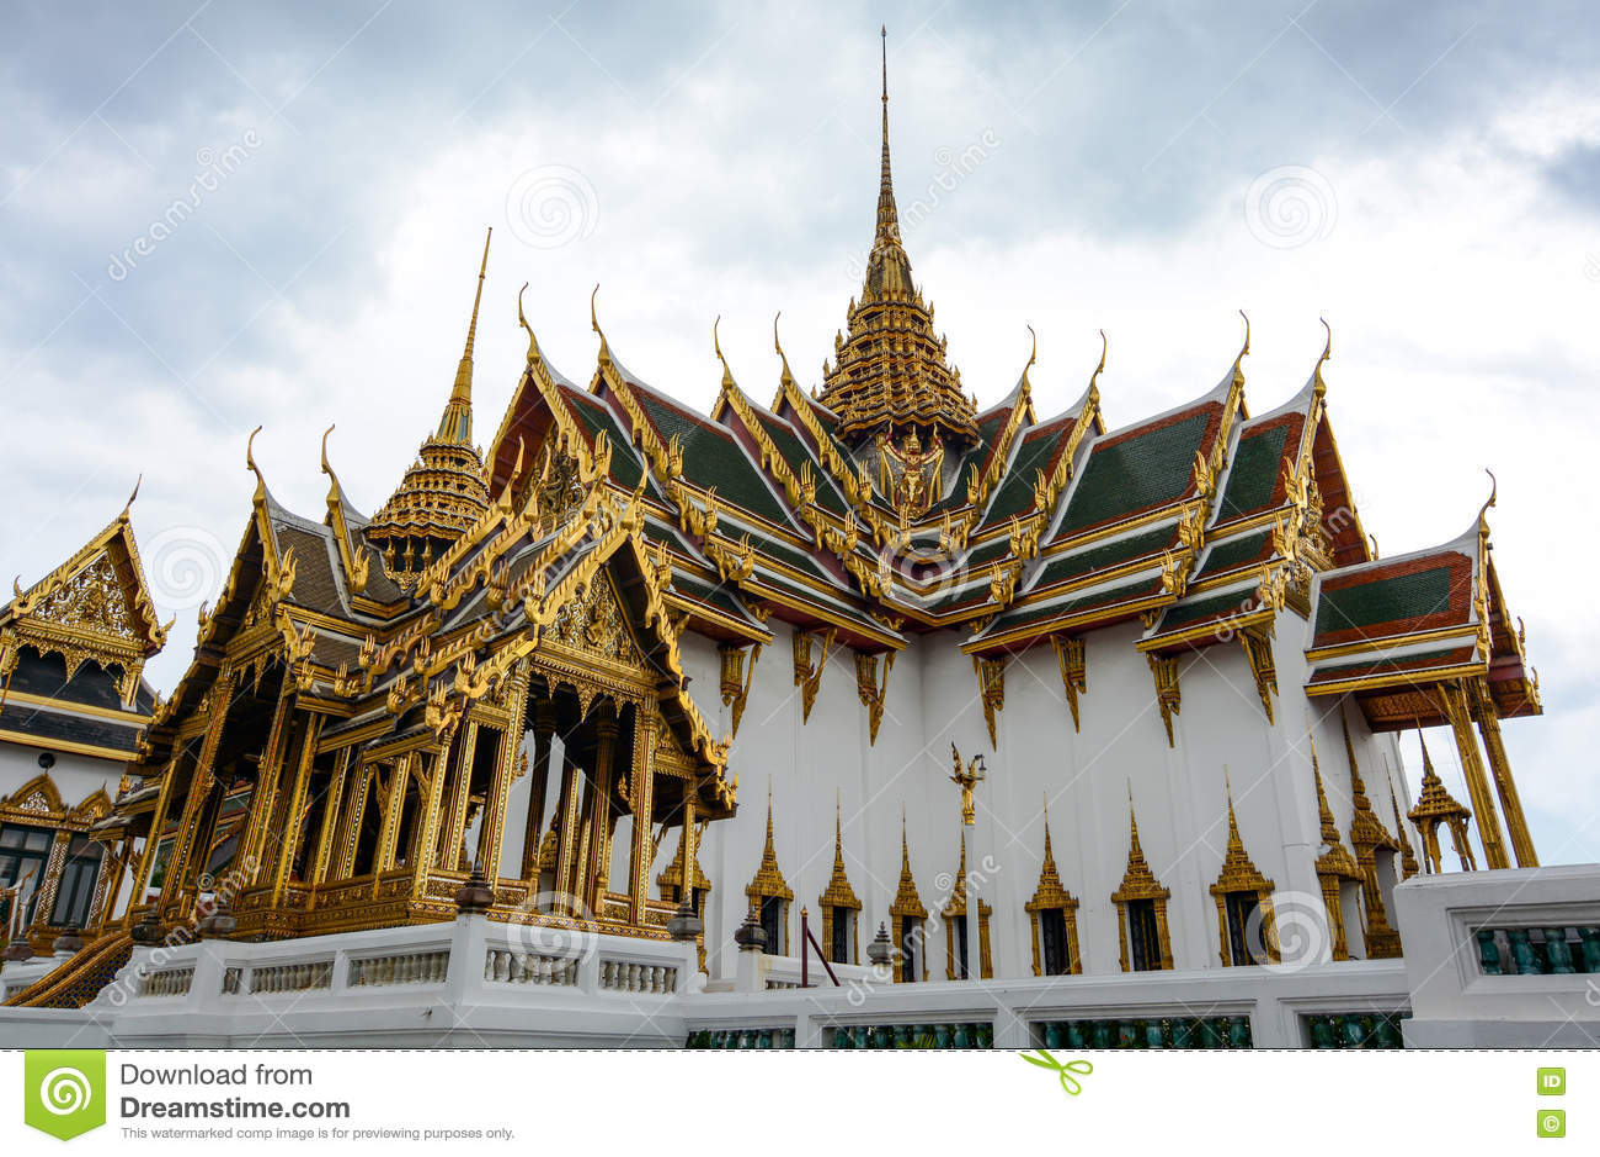 Grand Palace Phra Thinang Dusit Maha Prasat Throne Hall ...